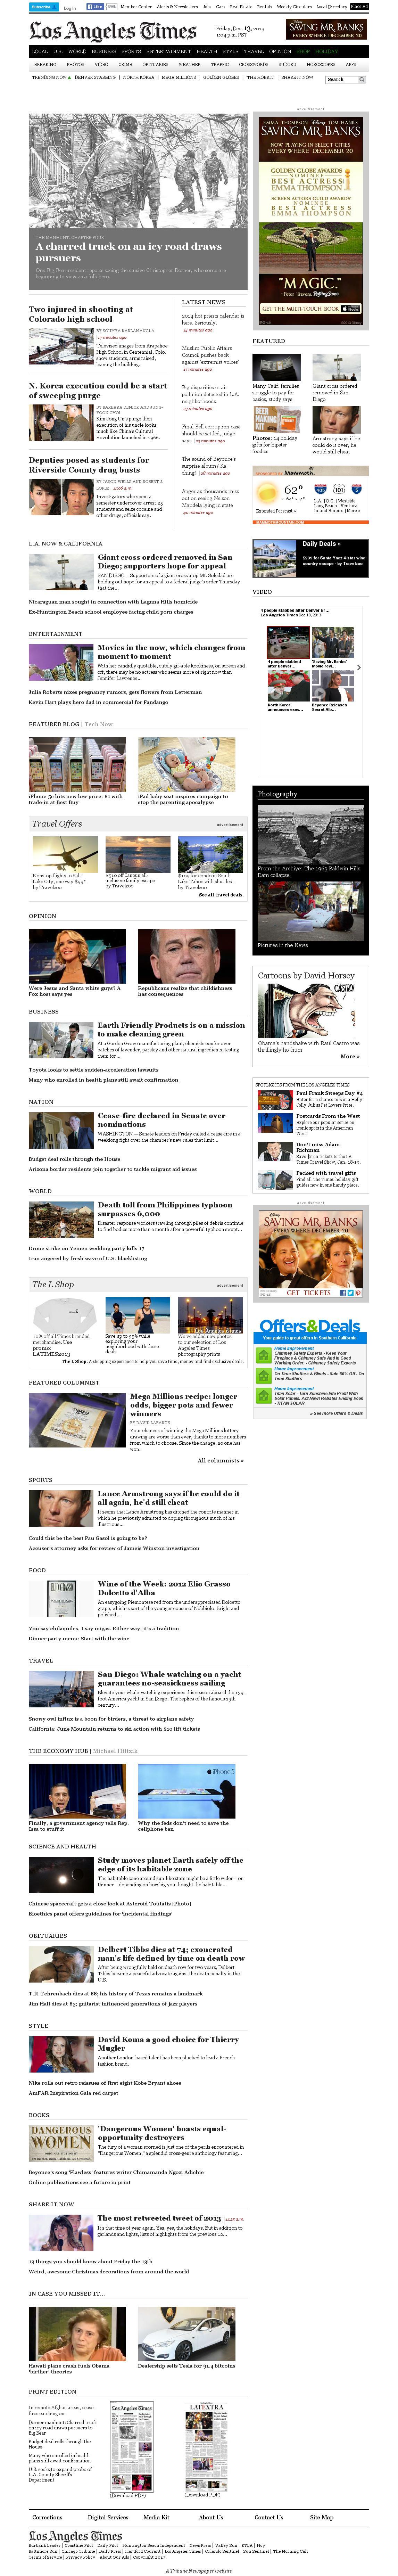 Los Angeles Times at Friday Dec. 13, 2013, 9:08 p.m. UTC